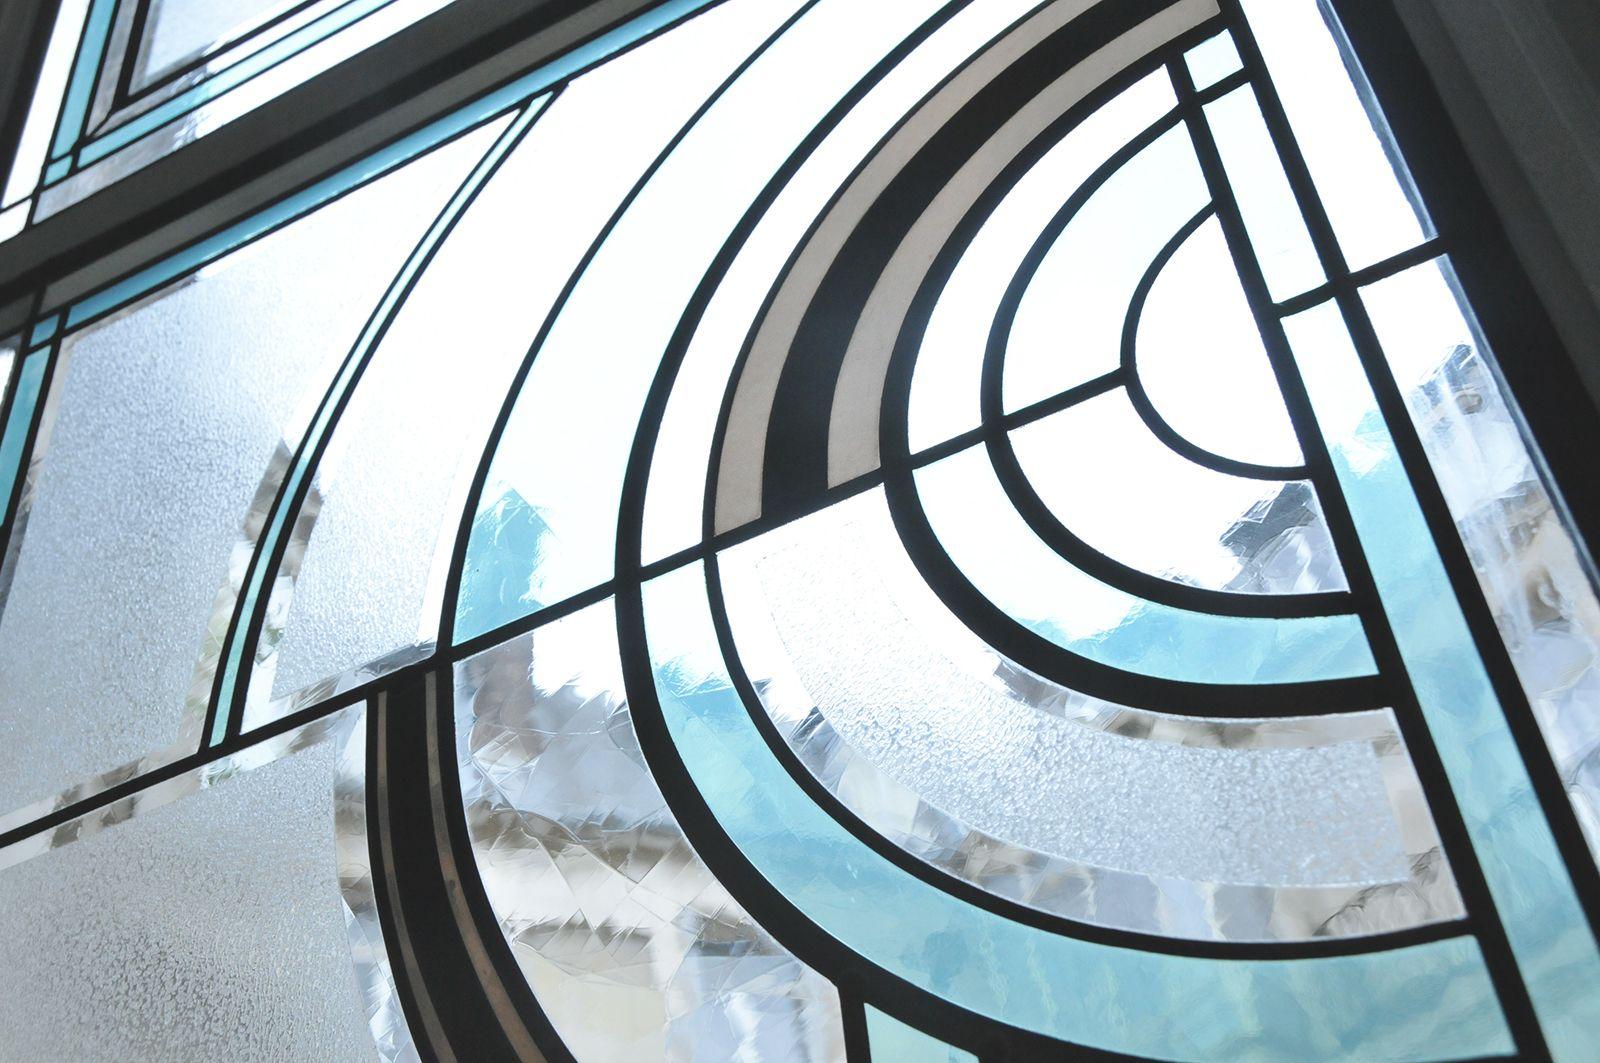 detail d 39 un motif art deco honky tonk vitrail art glass pinterest. Black Bedroom Furniture Sets. Home Design Ideas